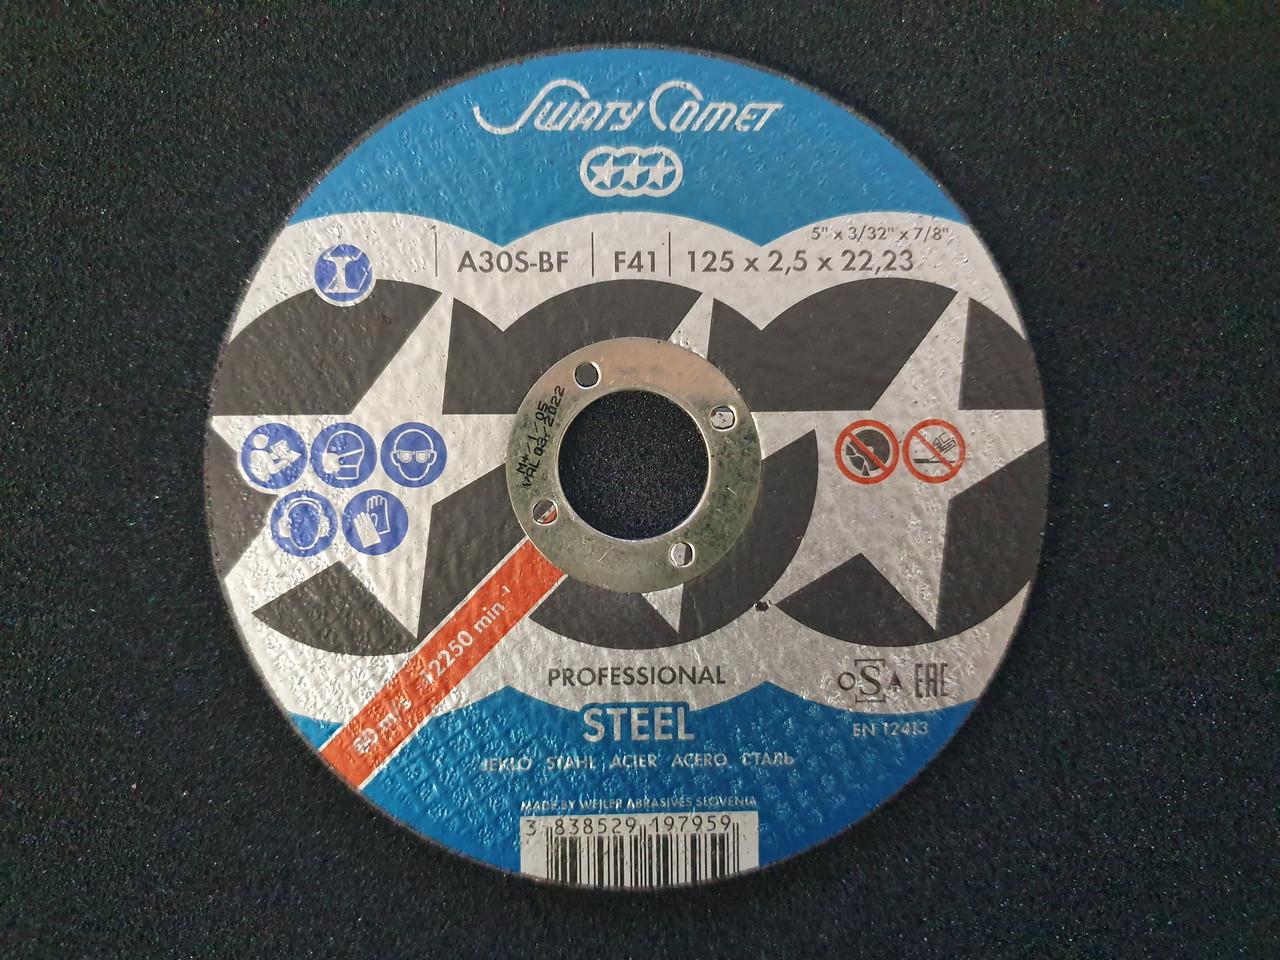 Круг отрезной Metal 125 х 2,5 х 22,23 SwatyComet A30S-BF (Weiler Abrasives, Slovenija)